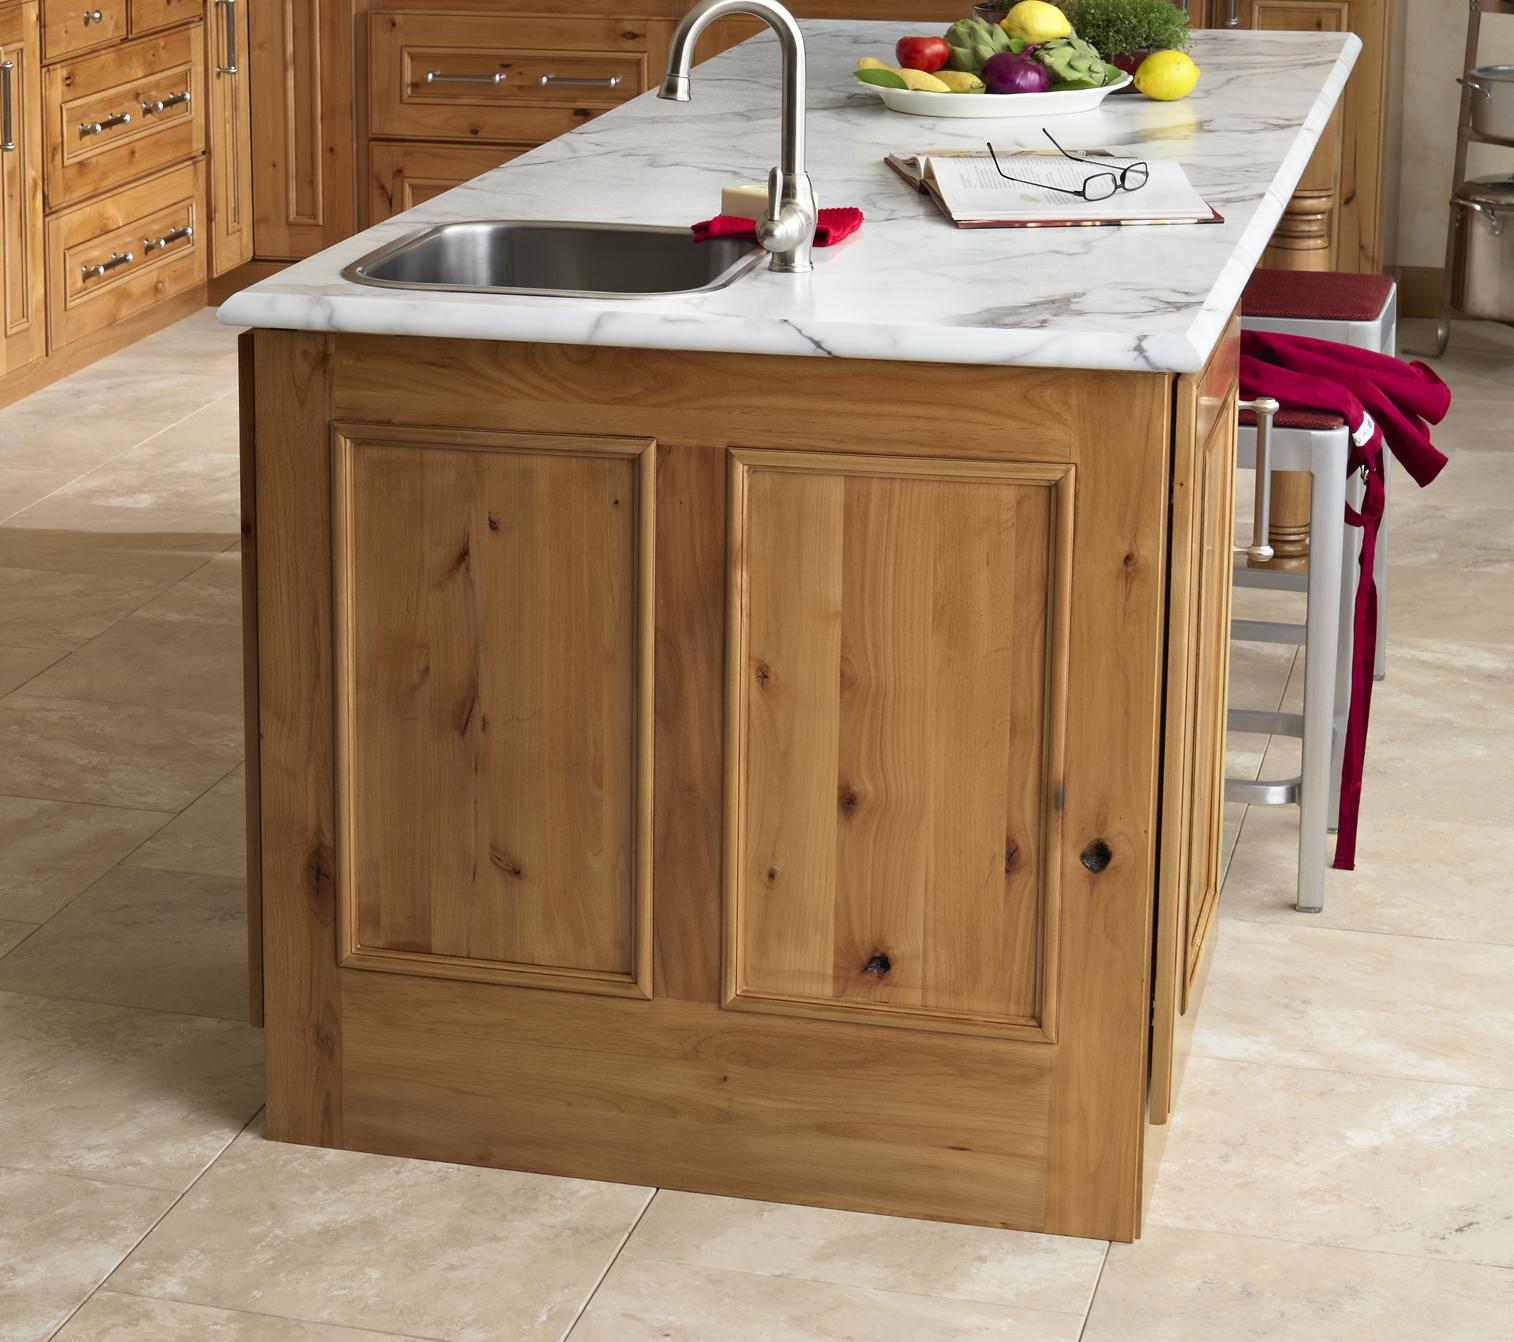 Hearthset Island Kitchen Cabinets